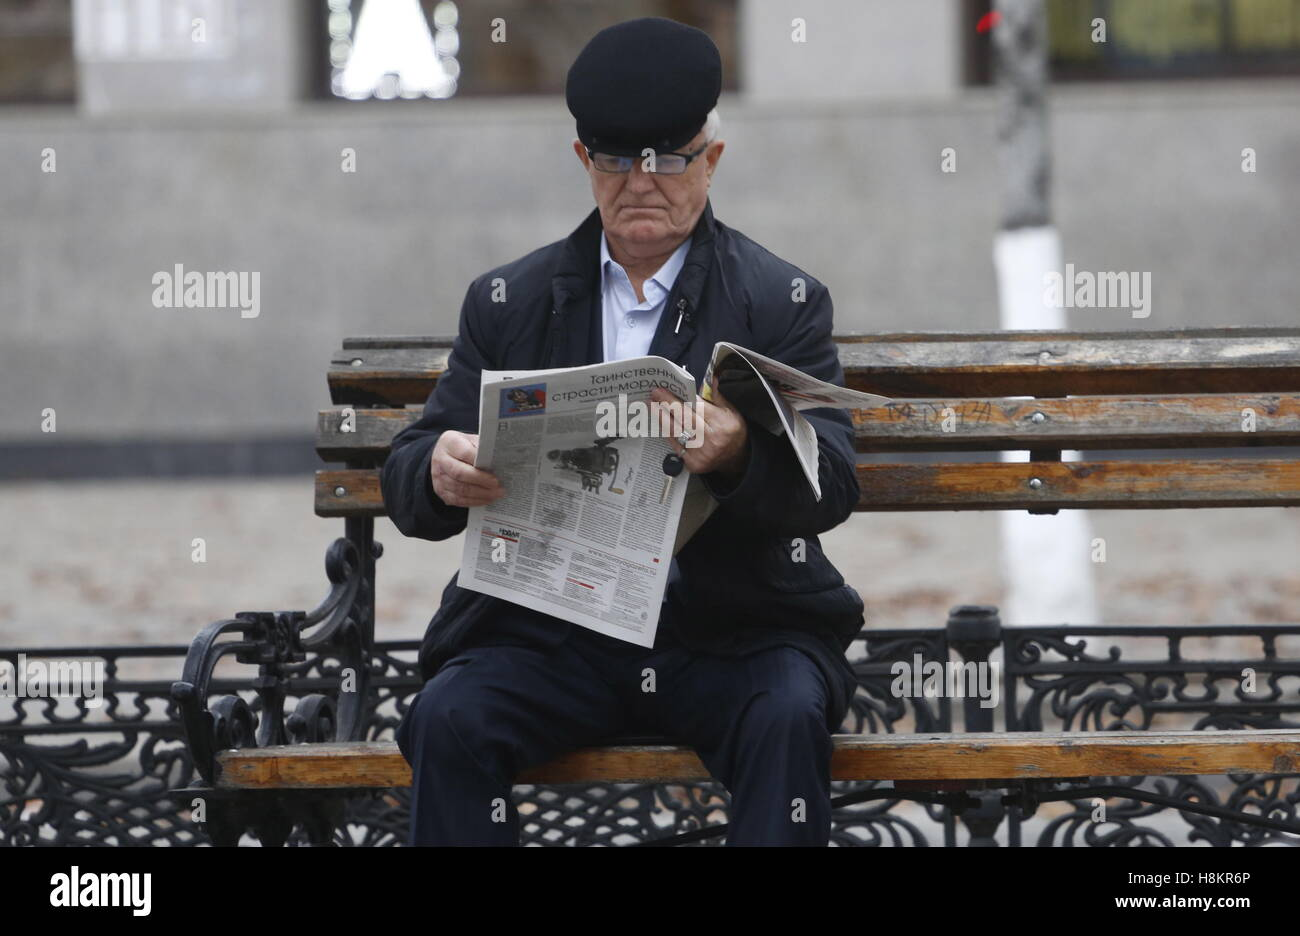 GROZNY, RUSSIA - NOVEMBER 13, 2016: An elderly man sits on a bench reading a newspaper. Valery Matytsin/TASS - Stock Image